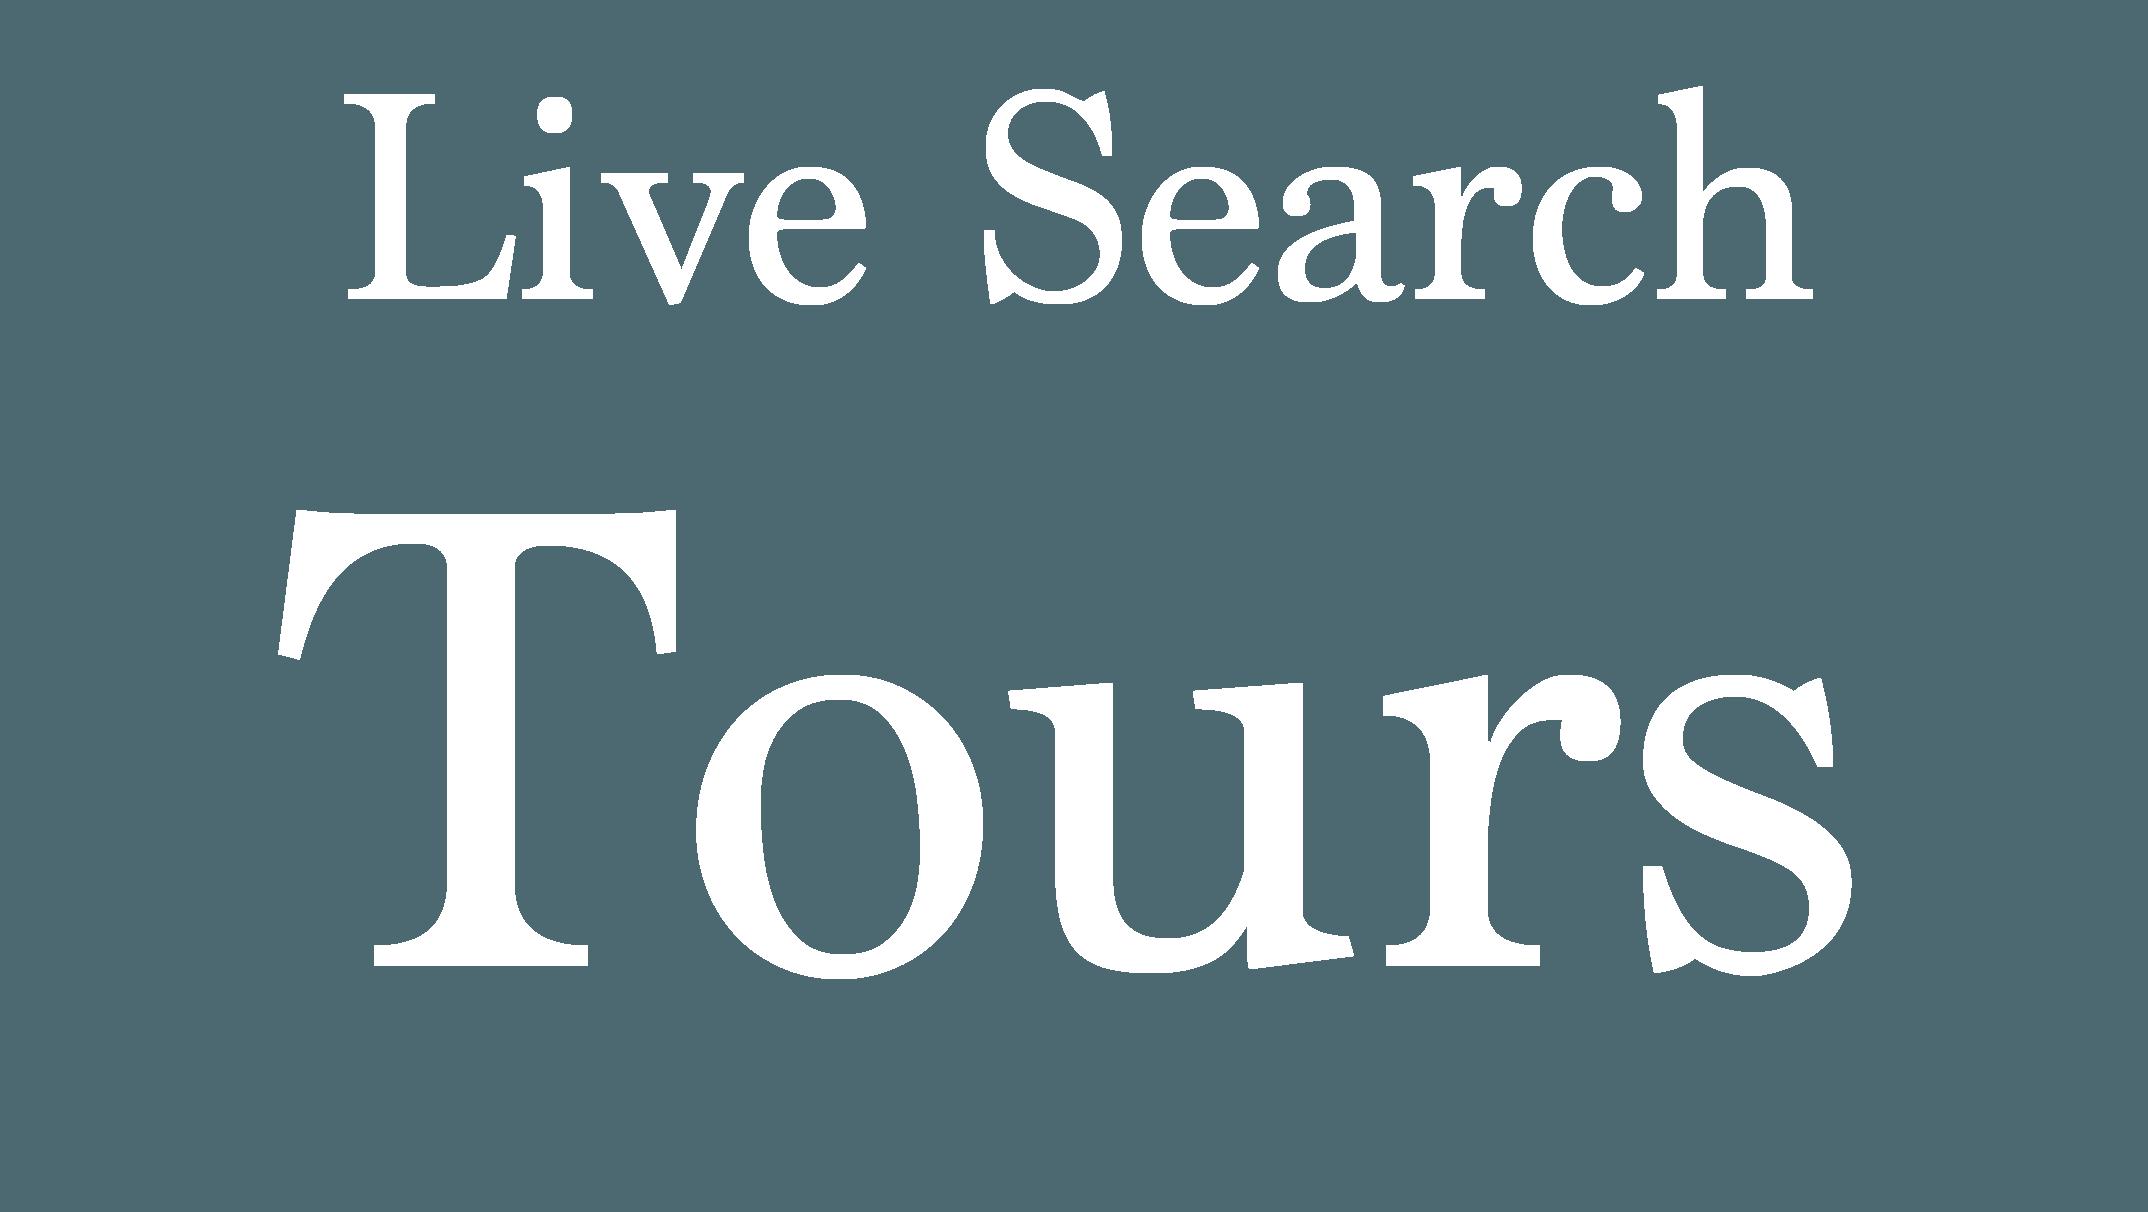 Live Search Tours